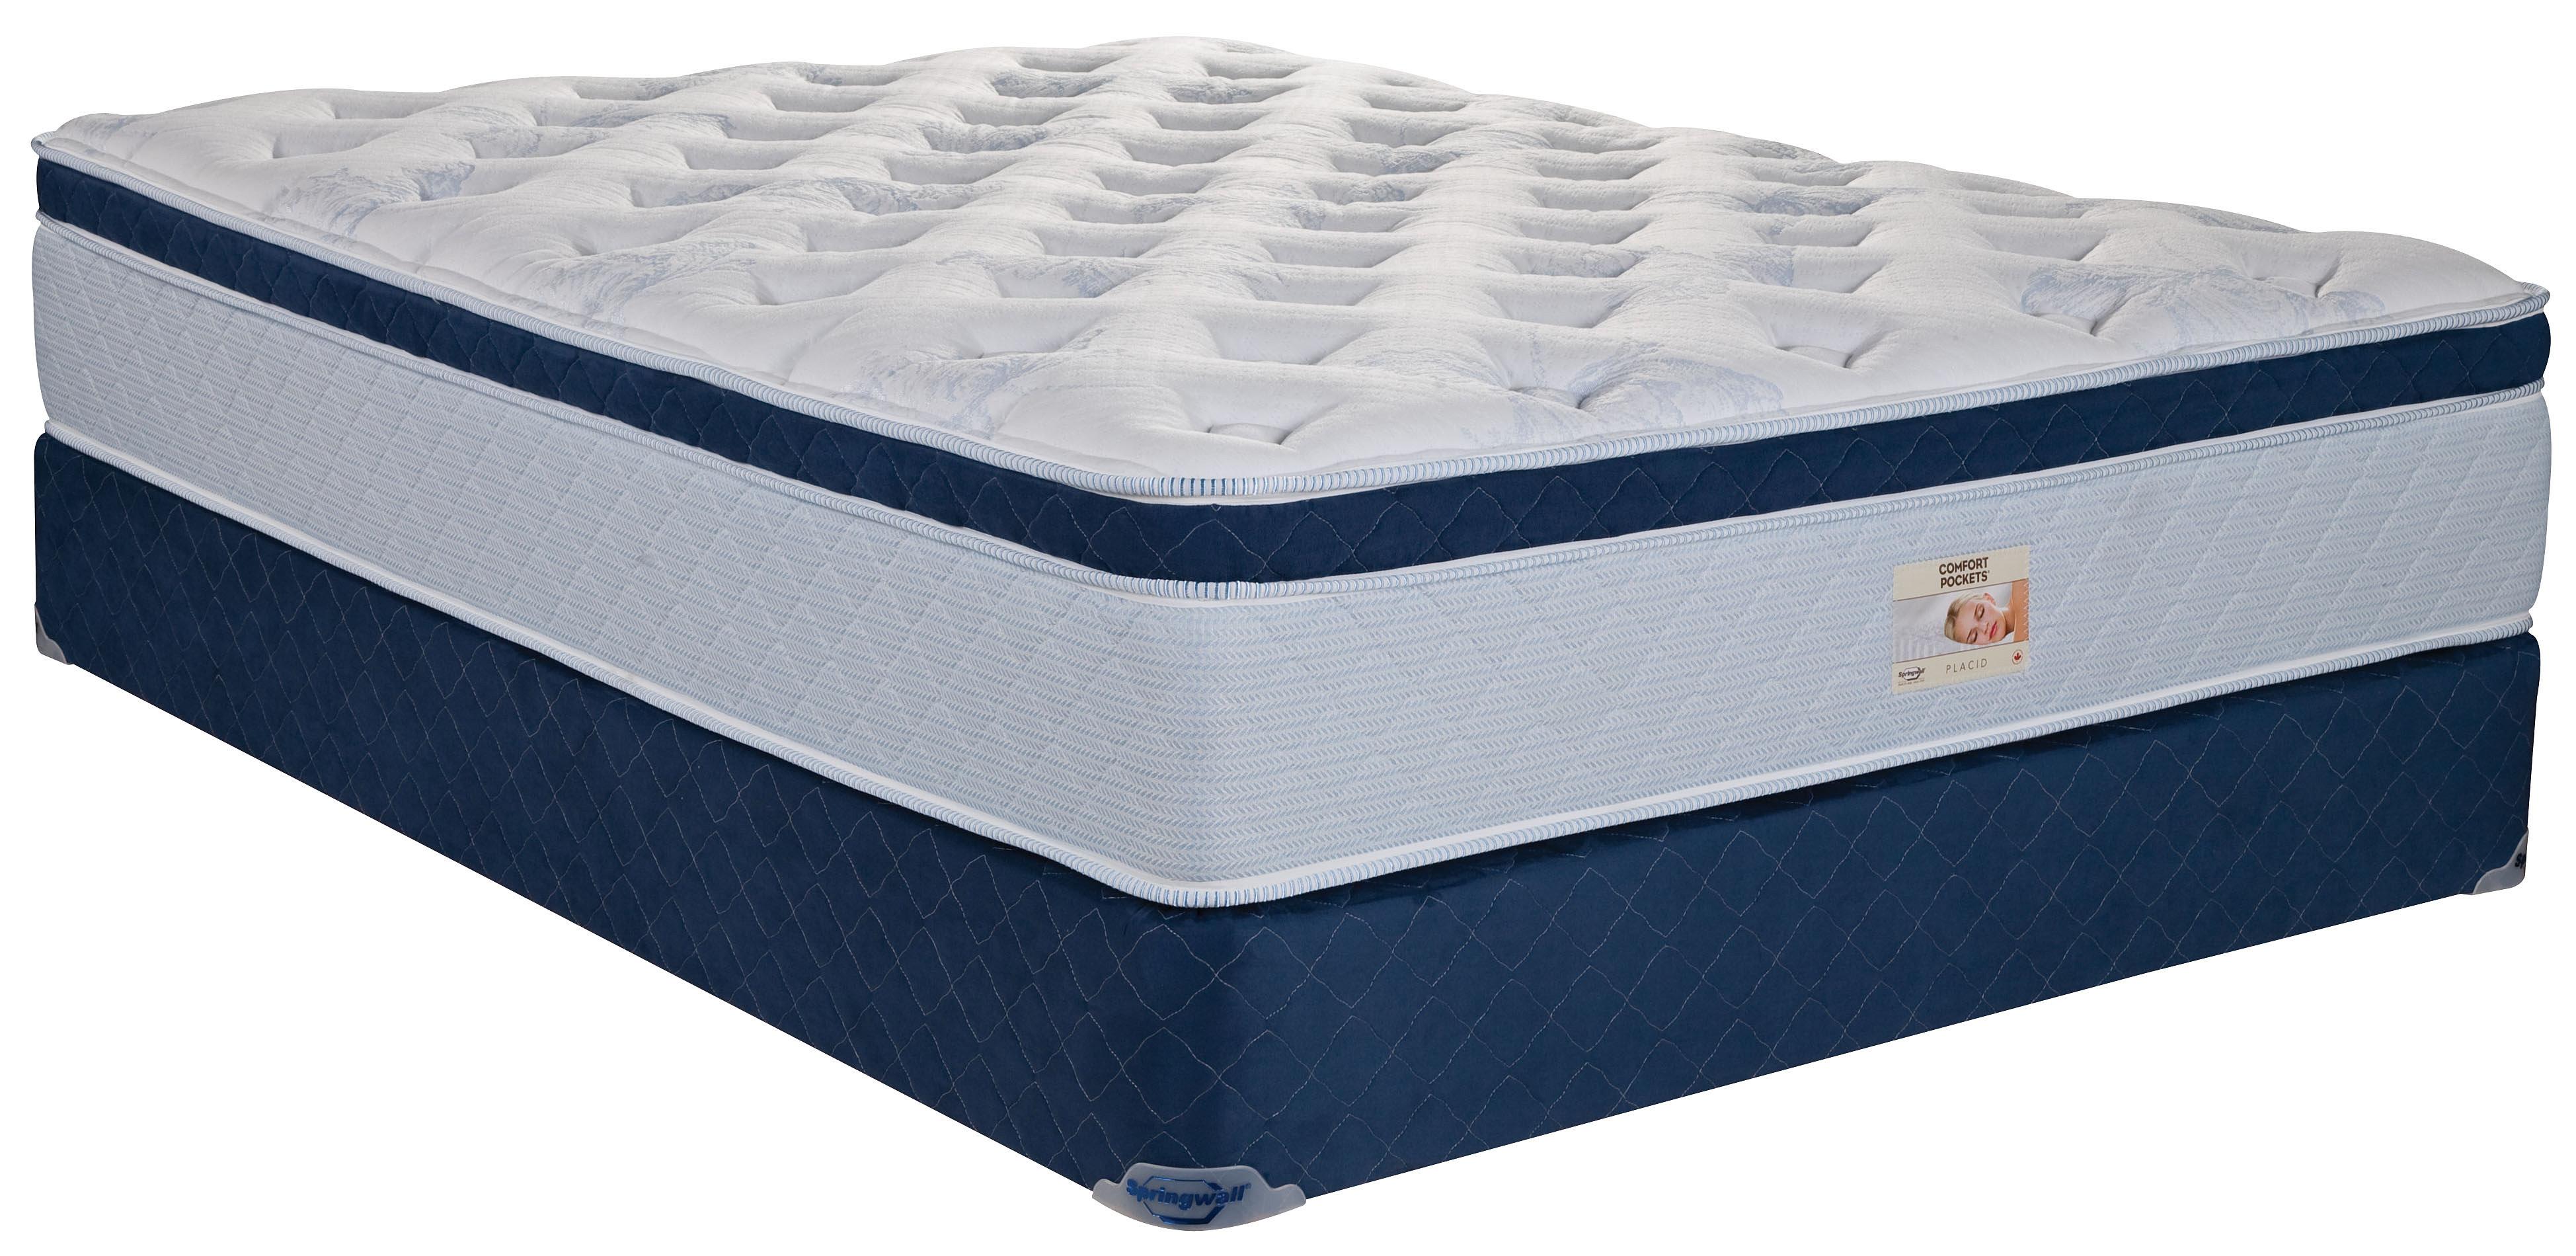 best foam mattress brands best and worst mattresses 2017. Black Bedroom Furniture Sets. Home Design Ideas